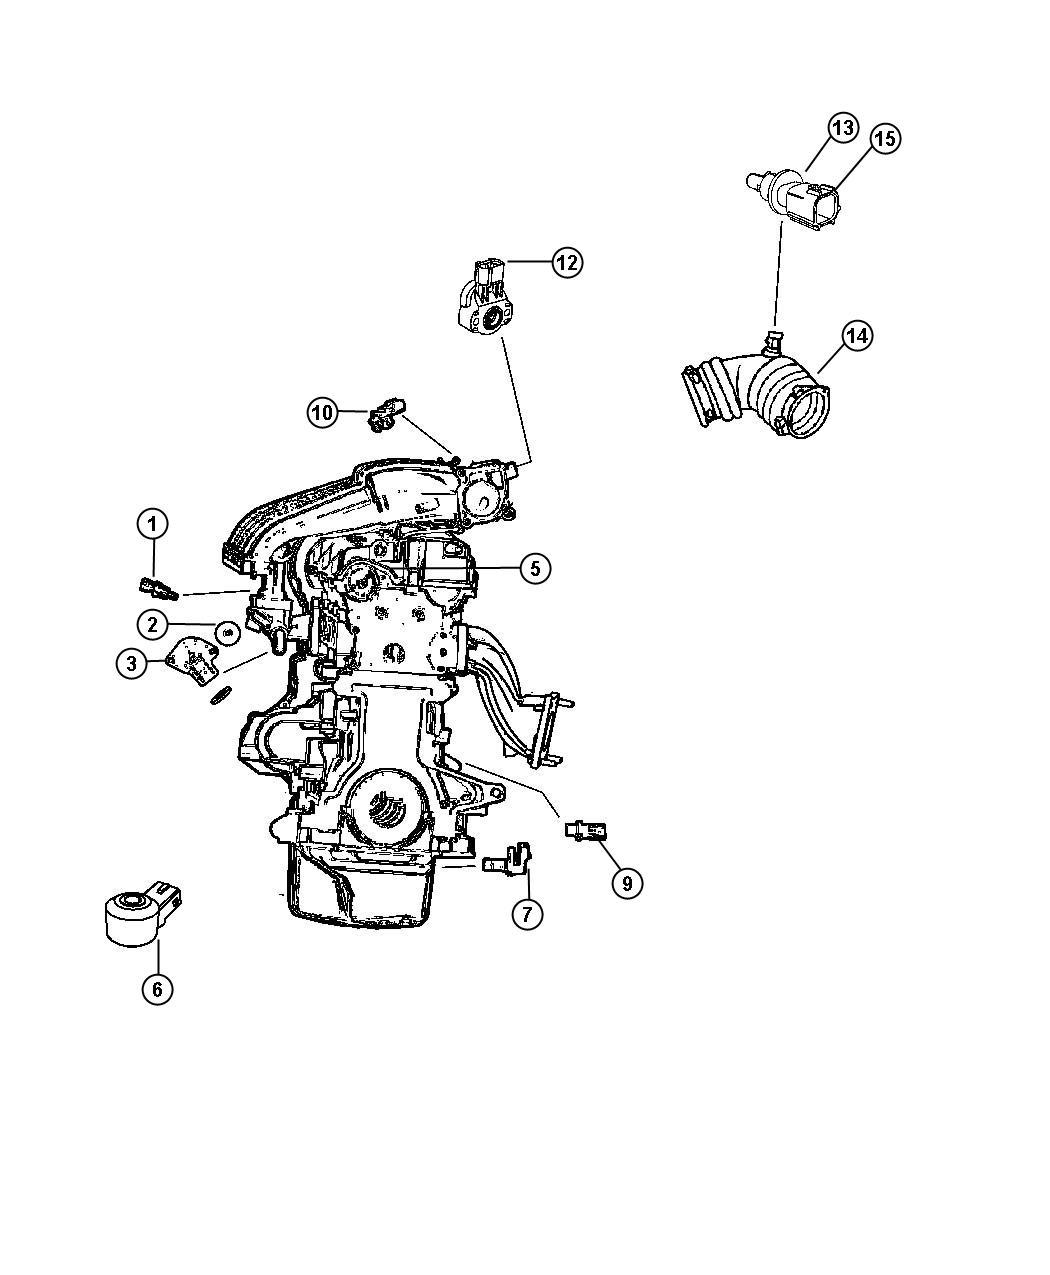 2003 Dodge Stratus Sensor. Crankshaft position. After 06